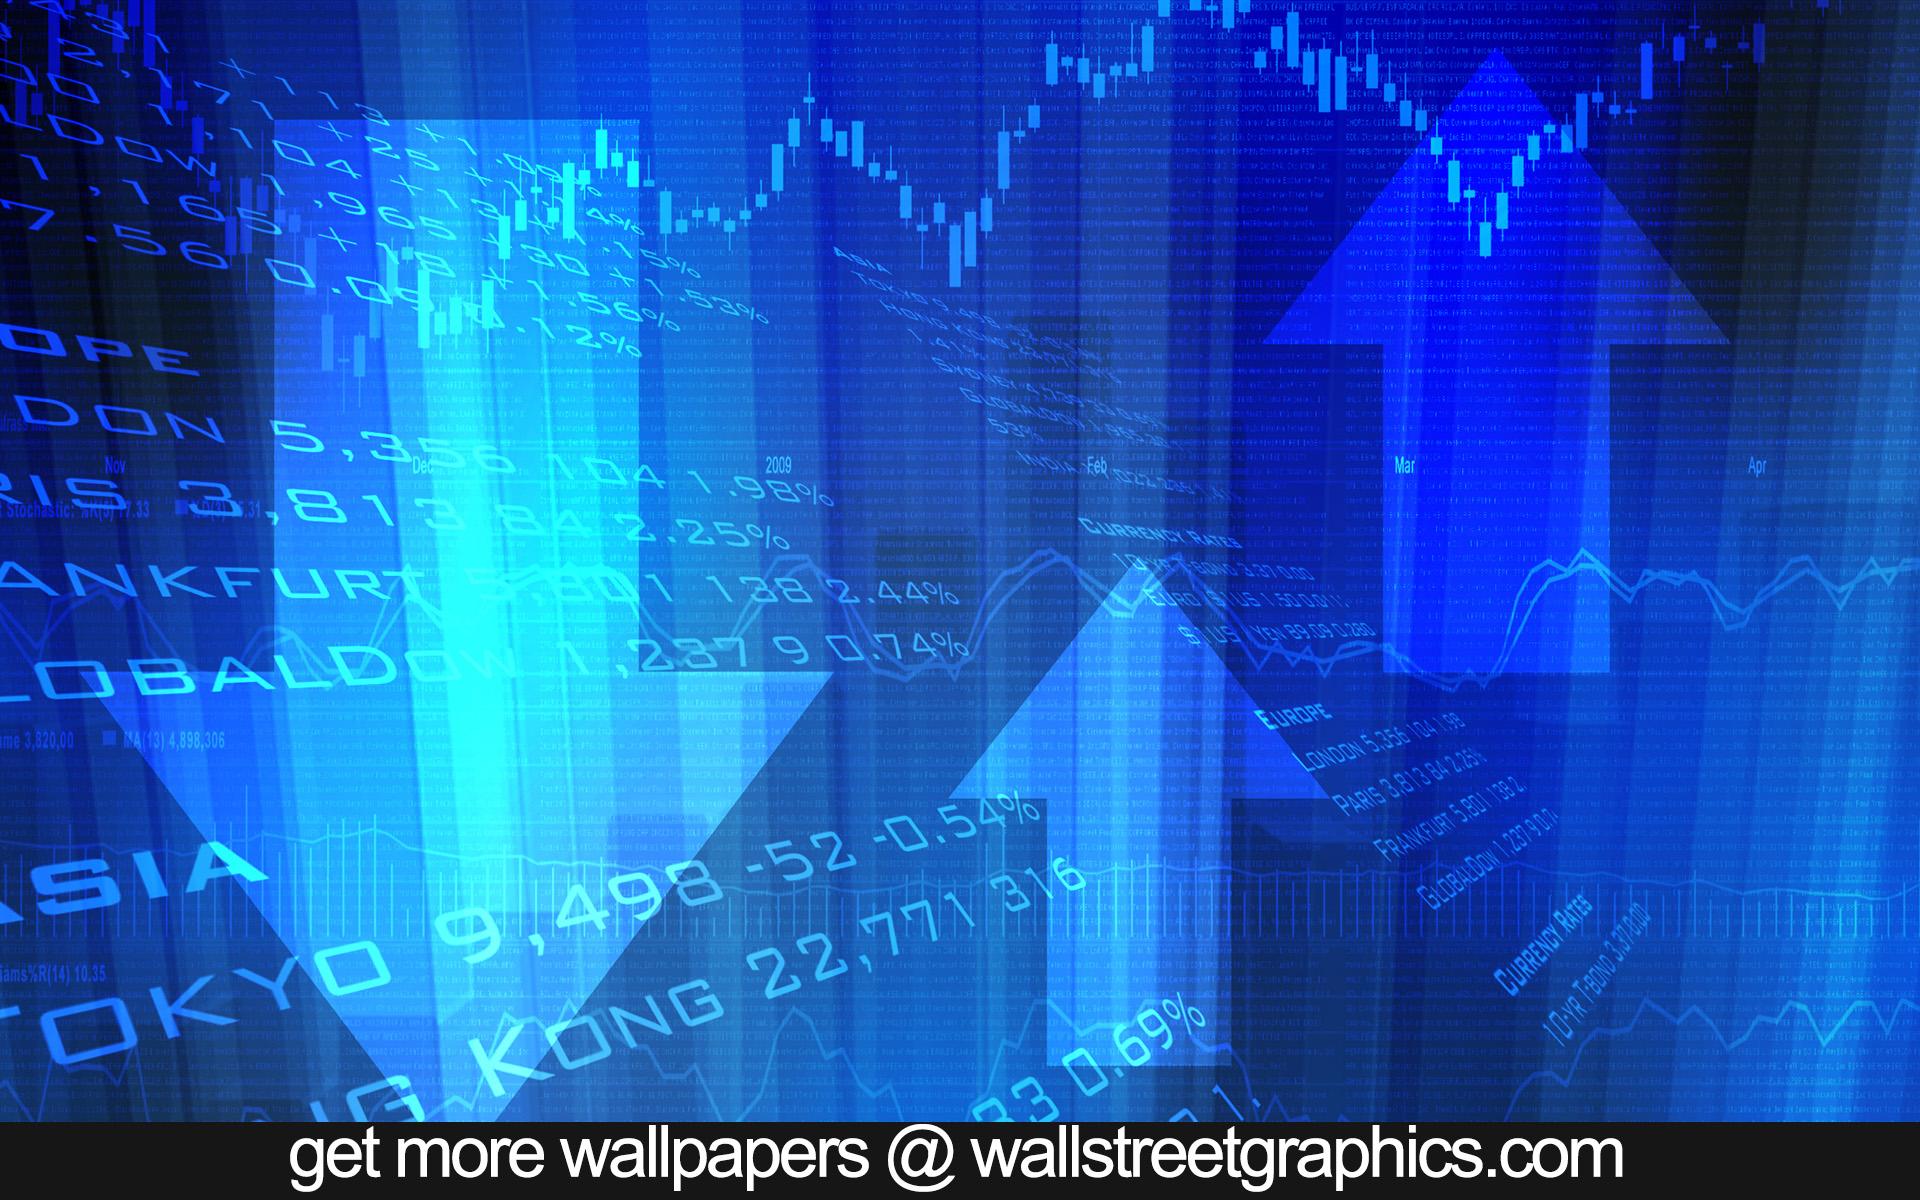 Wall Street Wallpaper Hd Wallpapersafari